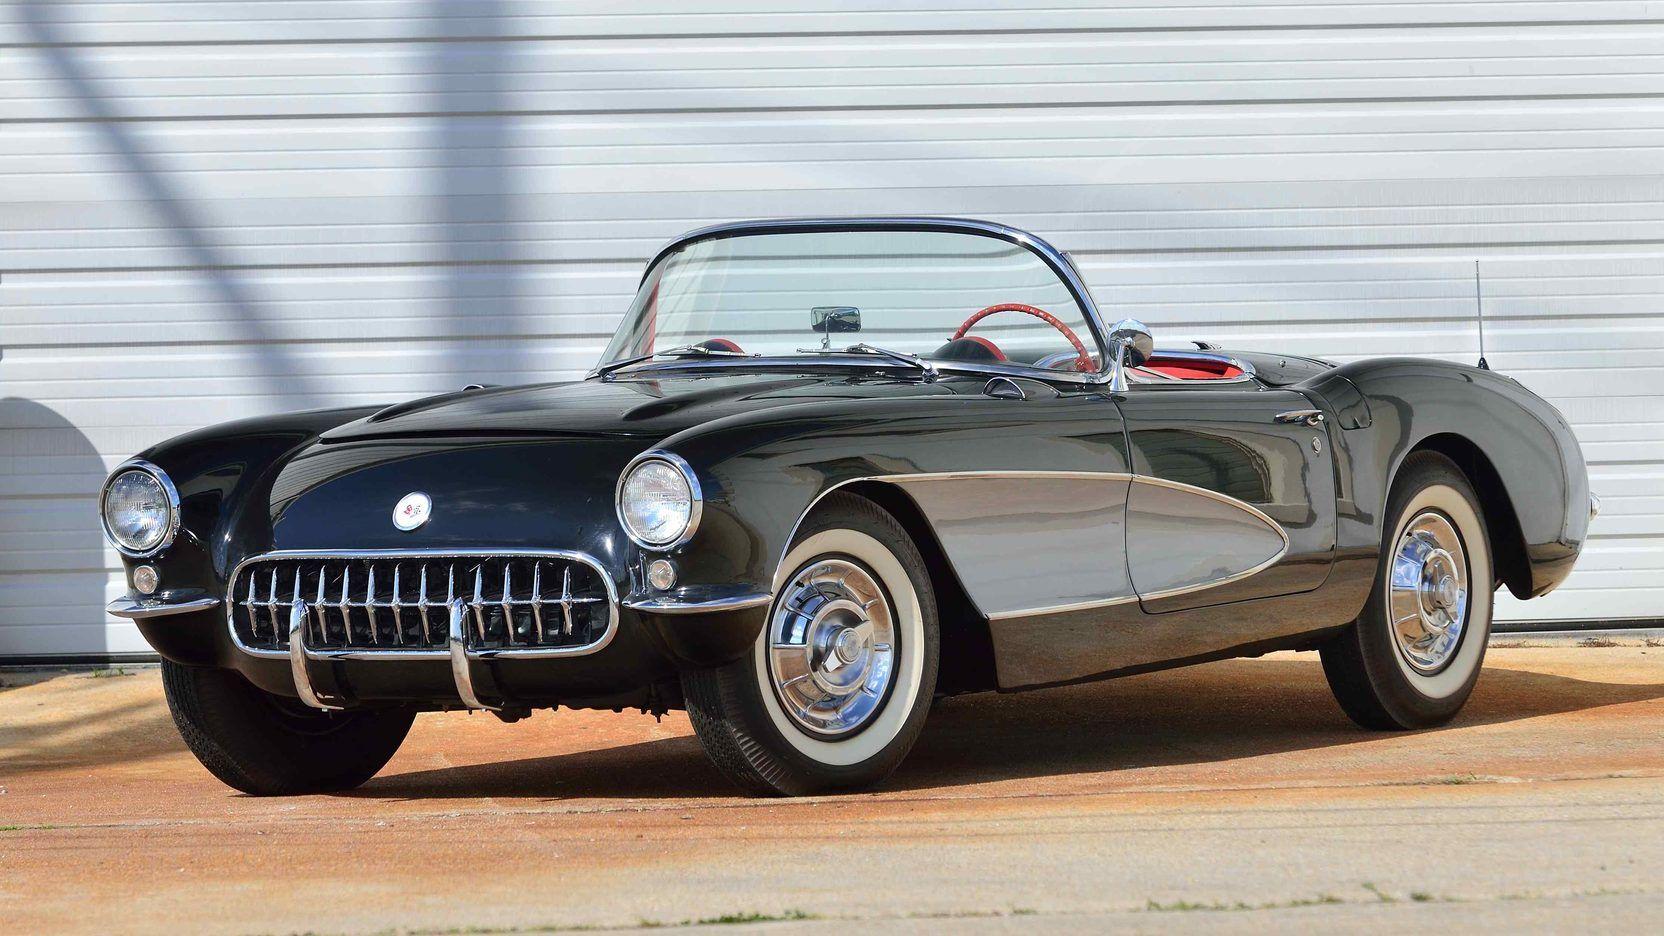 1956 Chevrolet Corvette Convertible presented as Lot T140